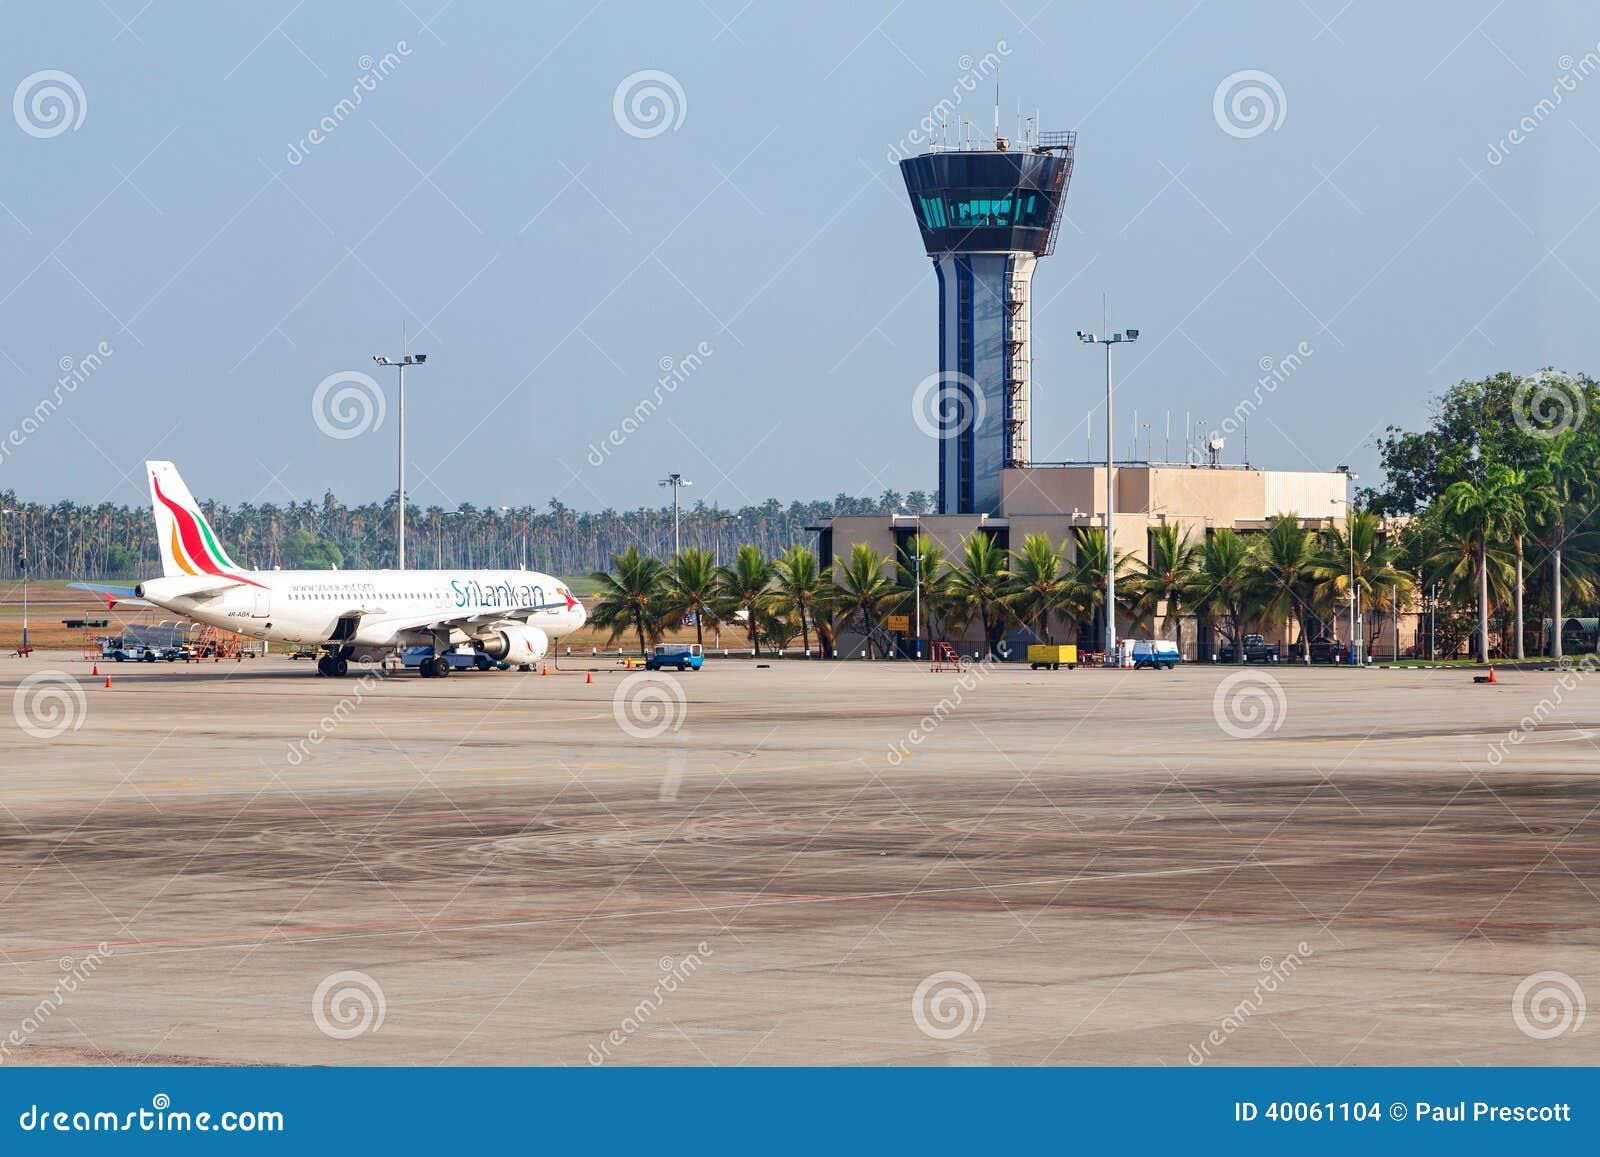 Sri lankan airplane parked on apron editorial stock image - Sri lankan passport office in colombo ...